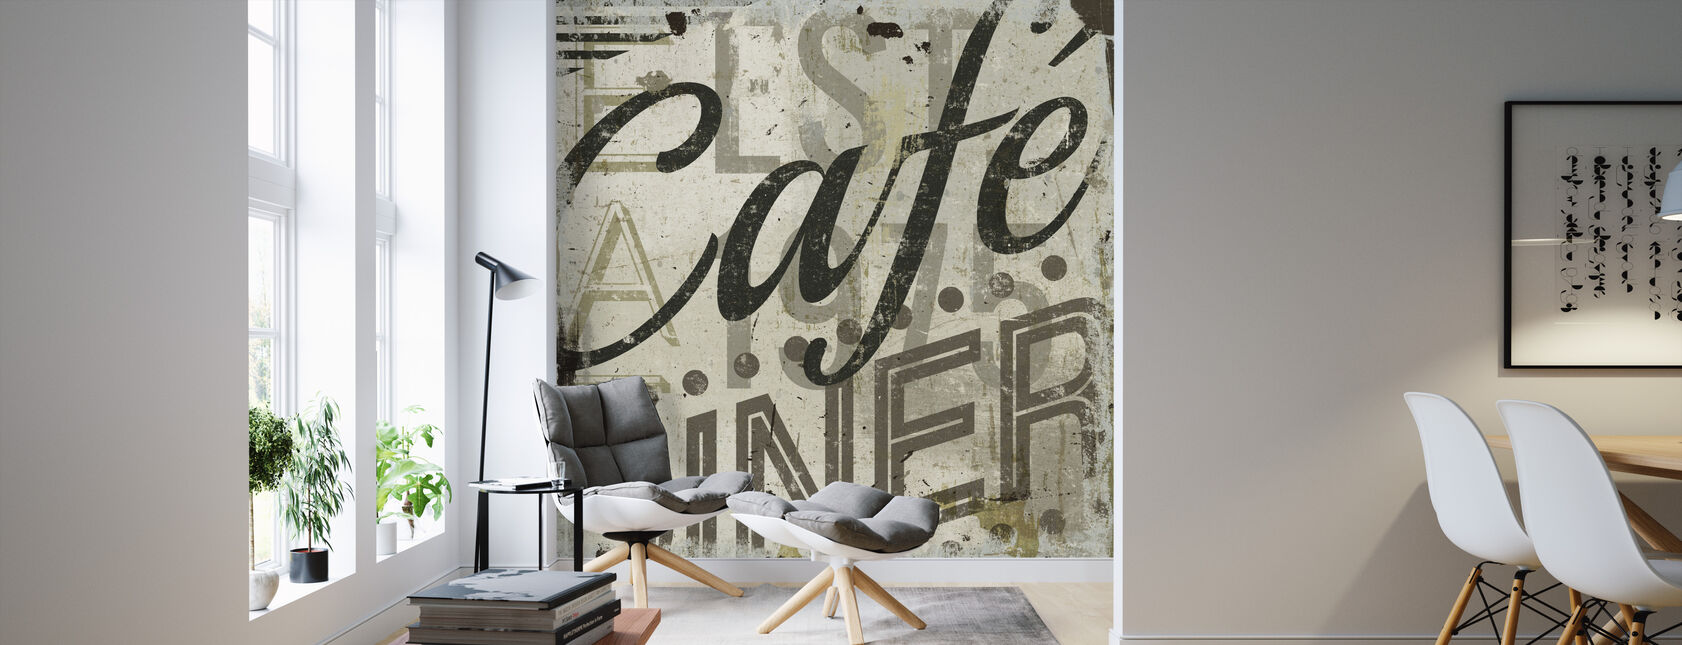 Restaurant Sign II - Wallpaper - Living Room